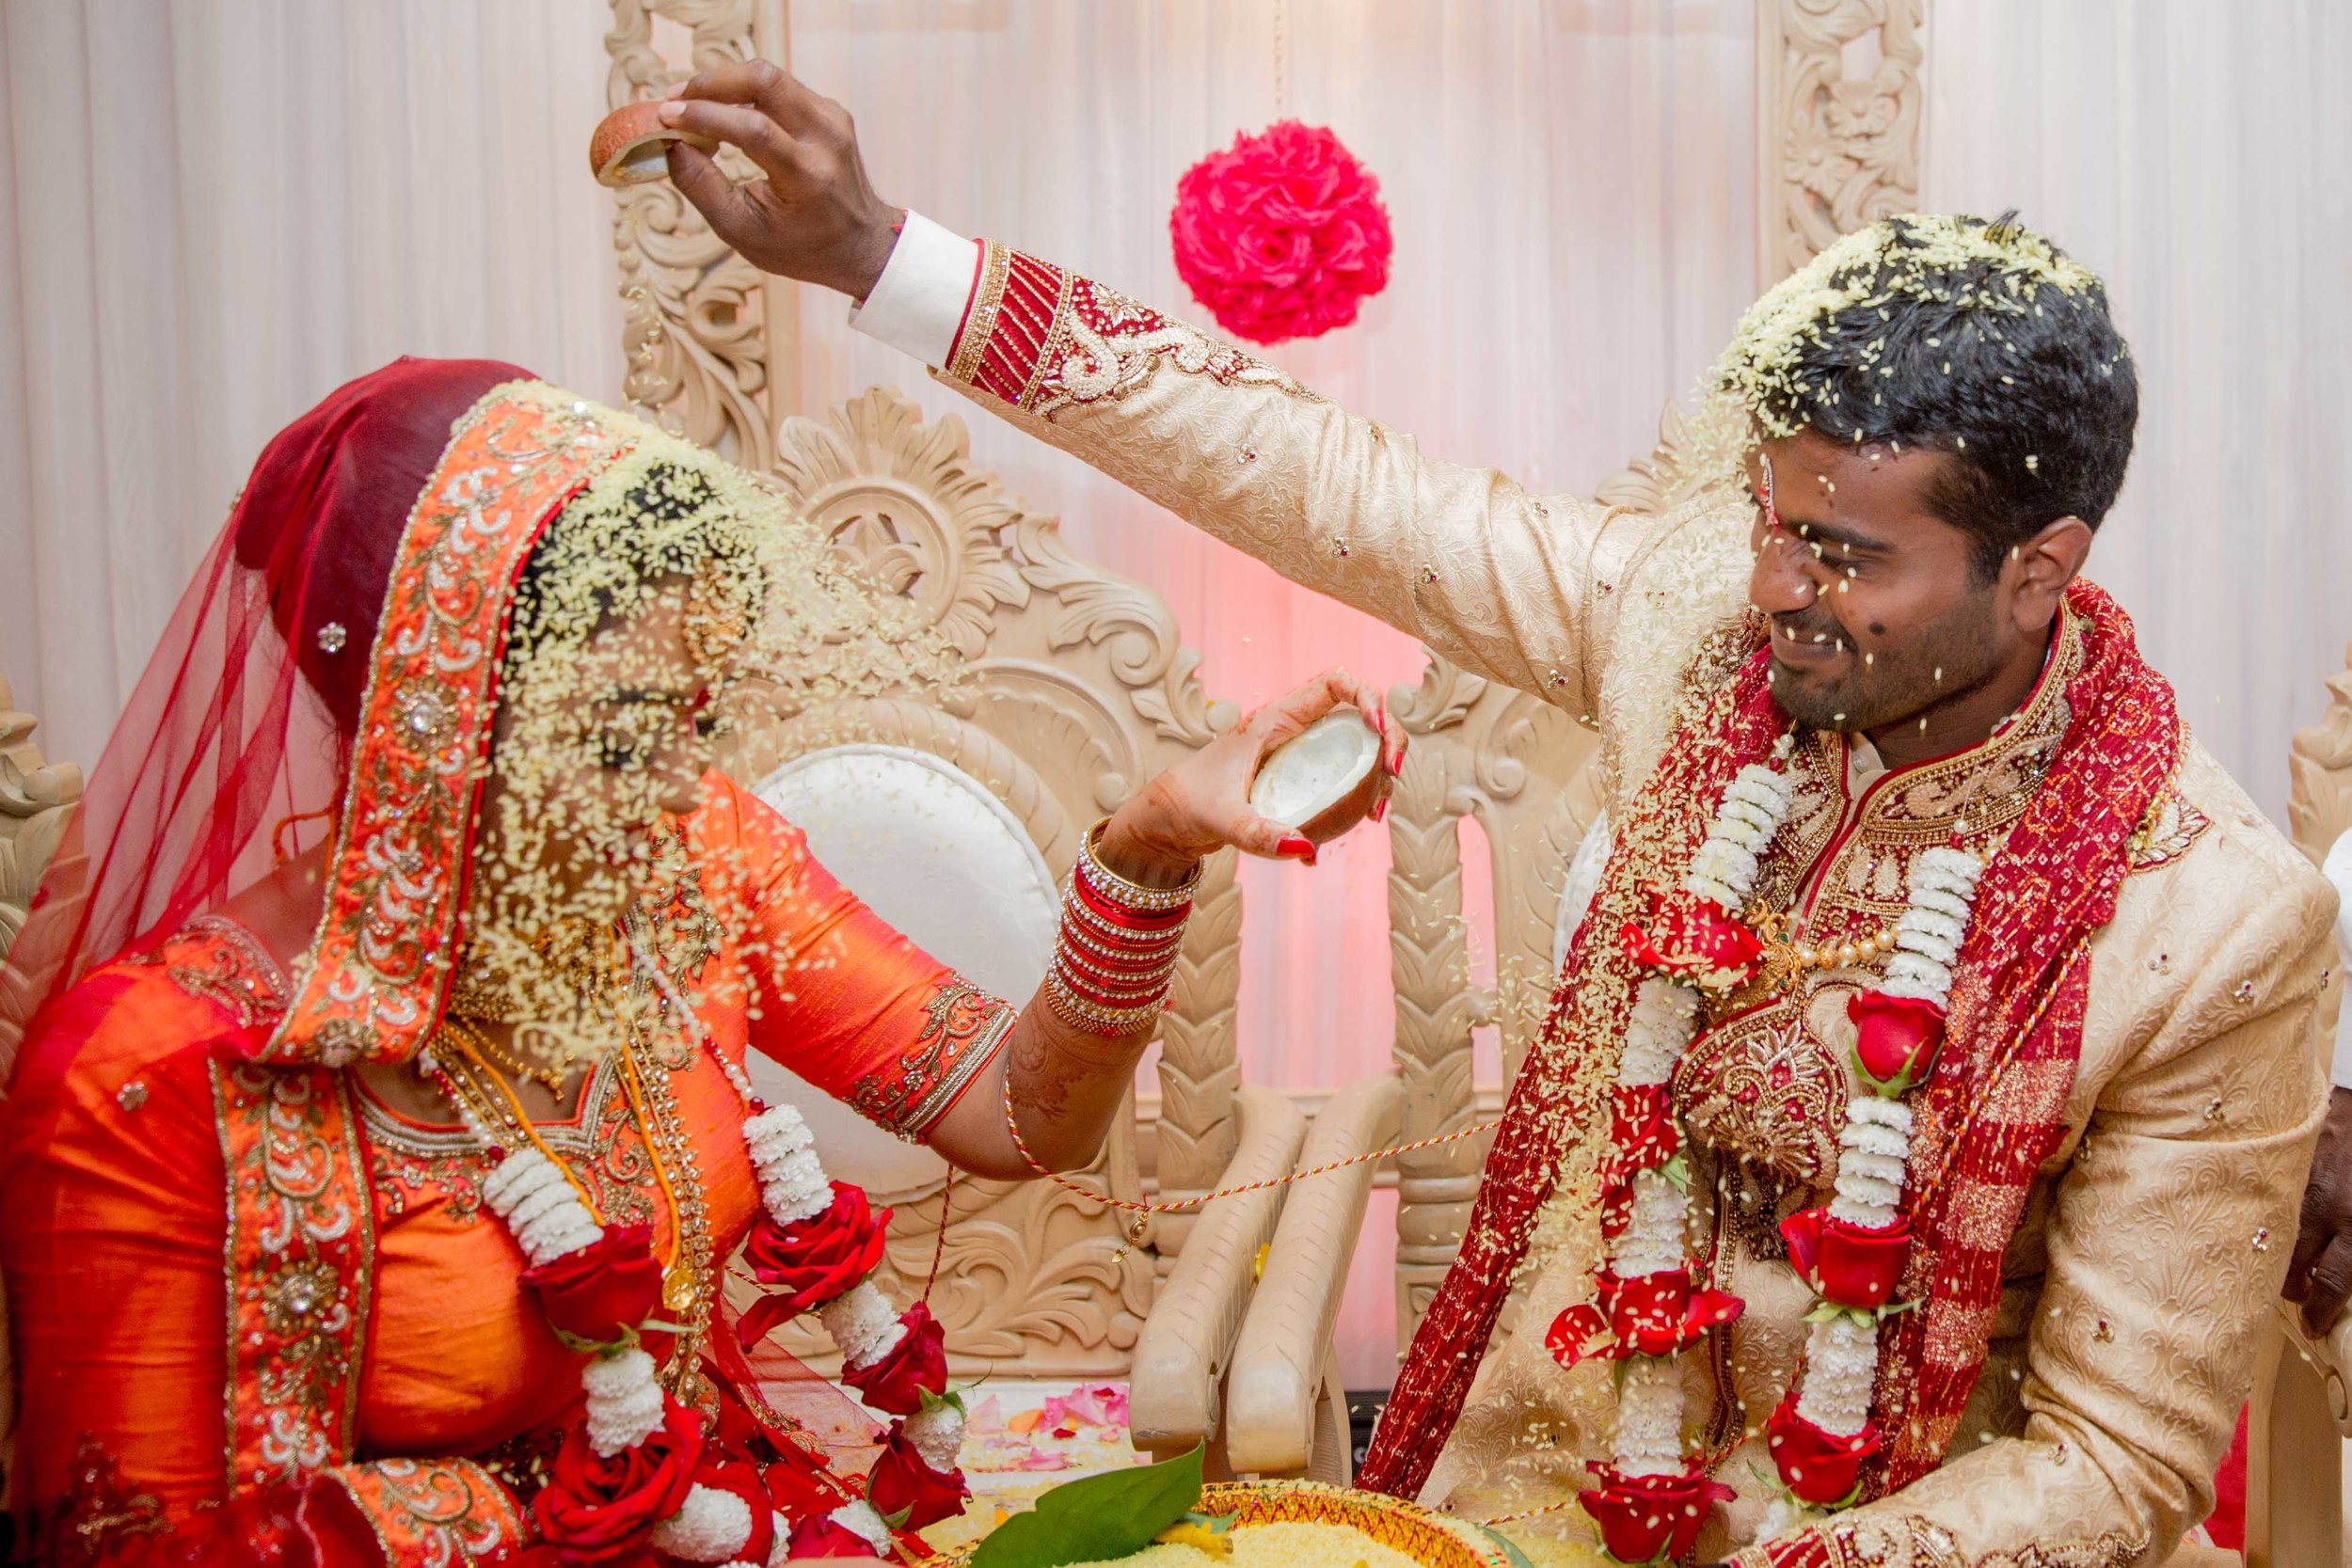 premier-banquetting-london-Hindu-asian-wedding-photographer-natalia-smith-photography-37.jpg